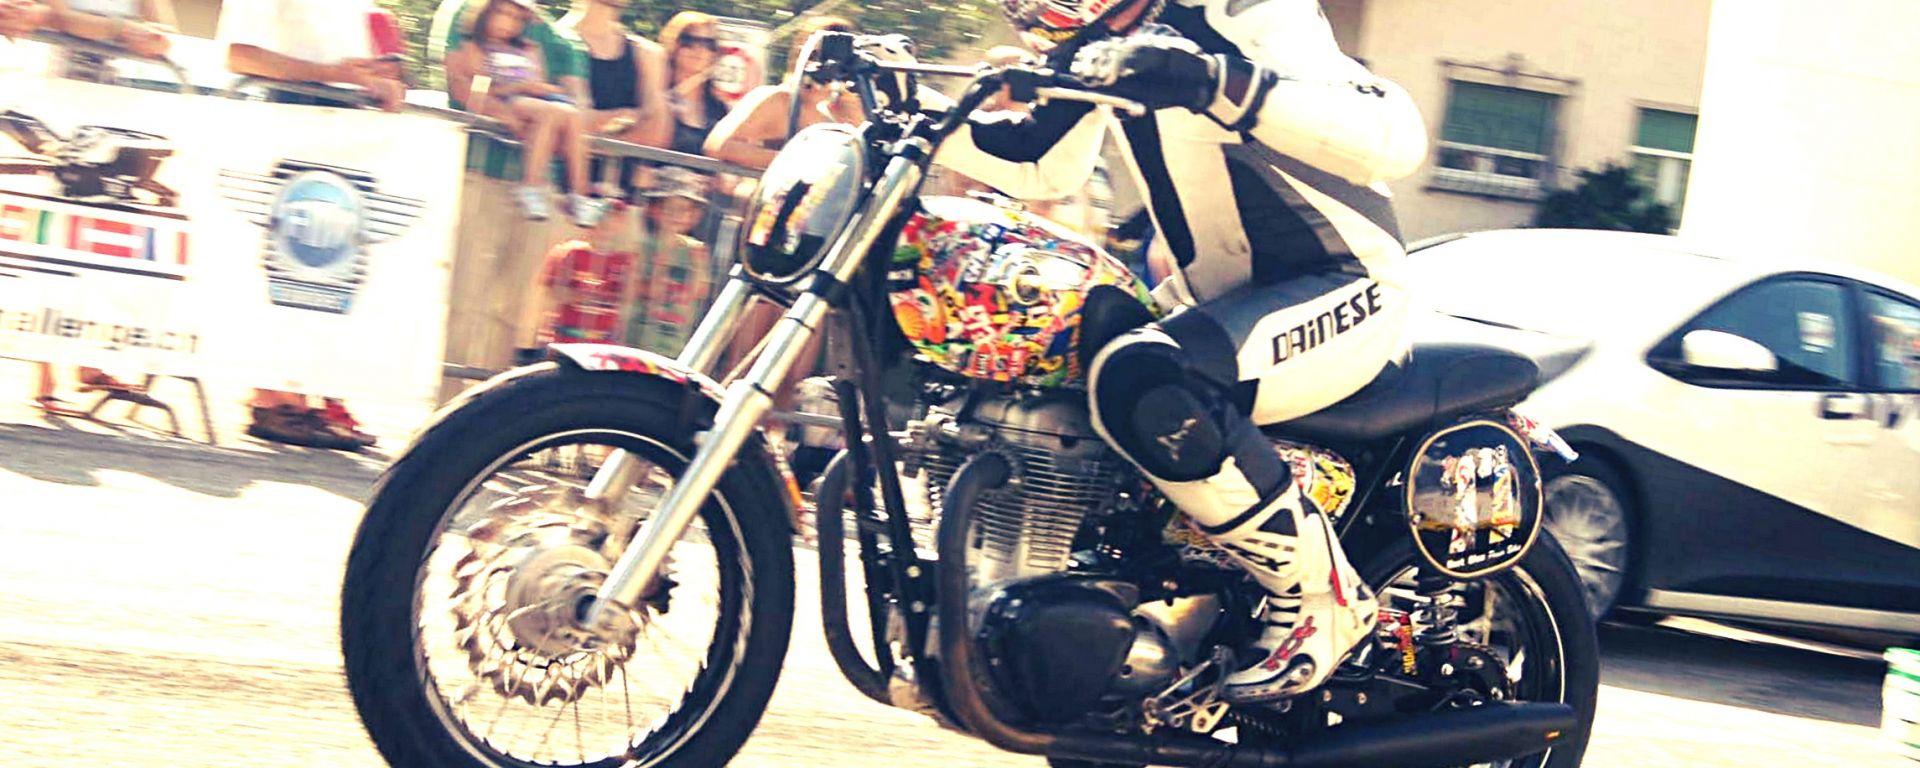 Gare Kawasaki W800 Cup Motorbox